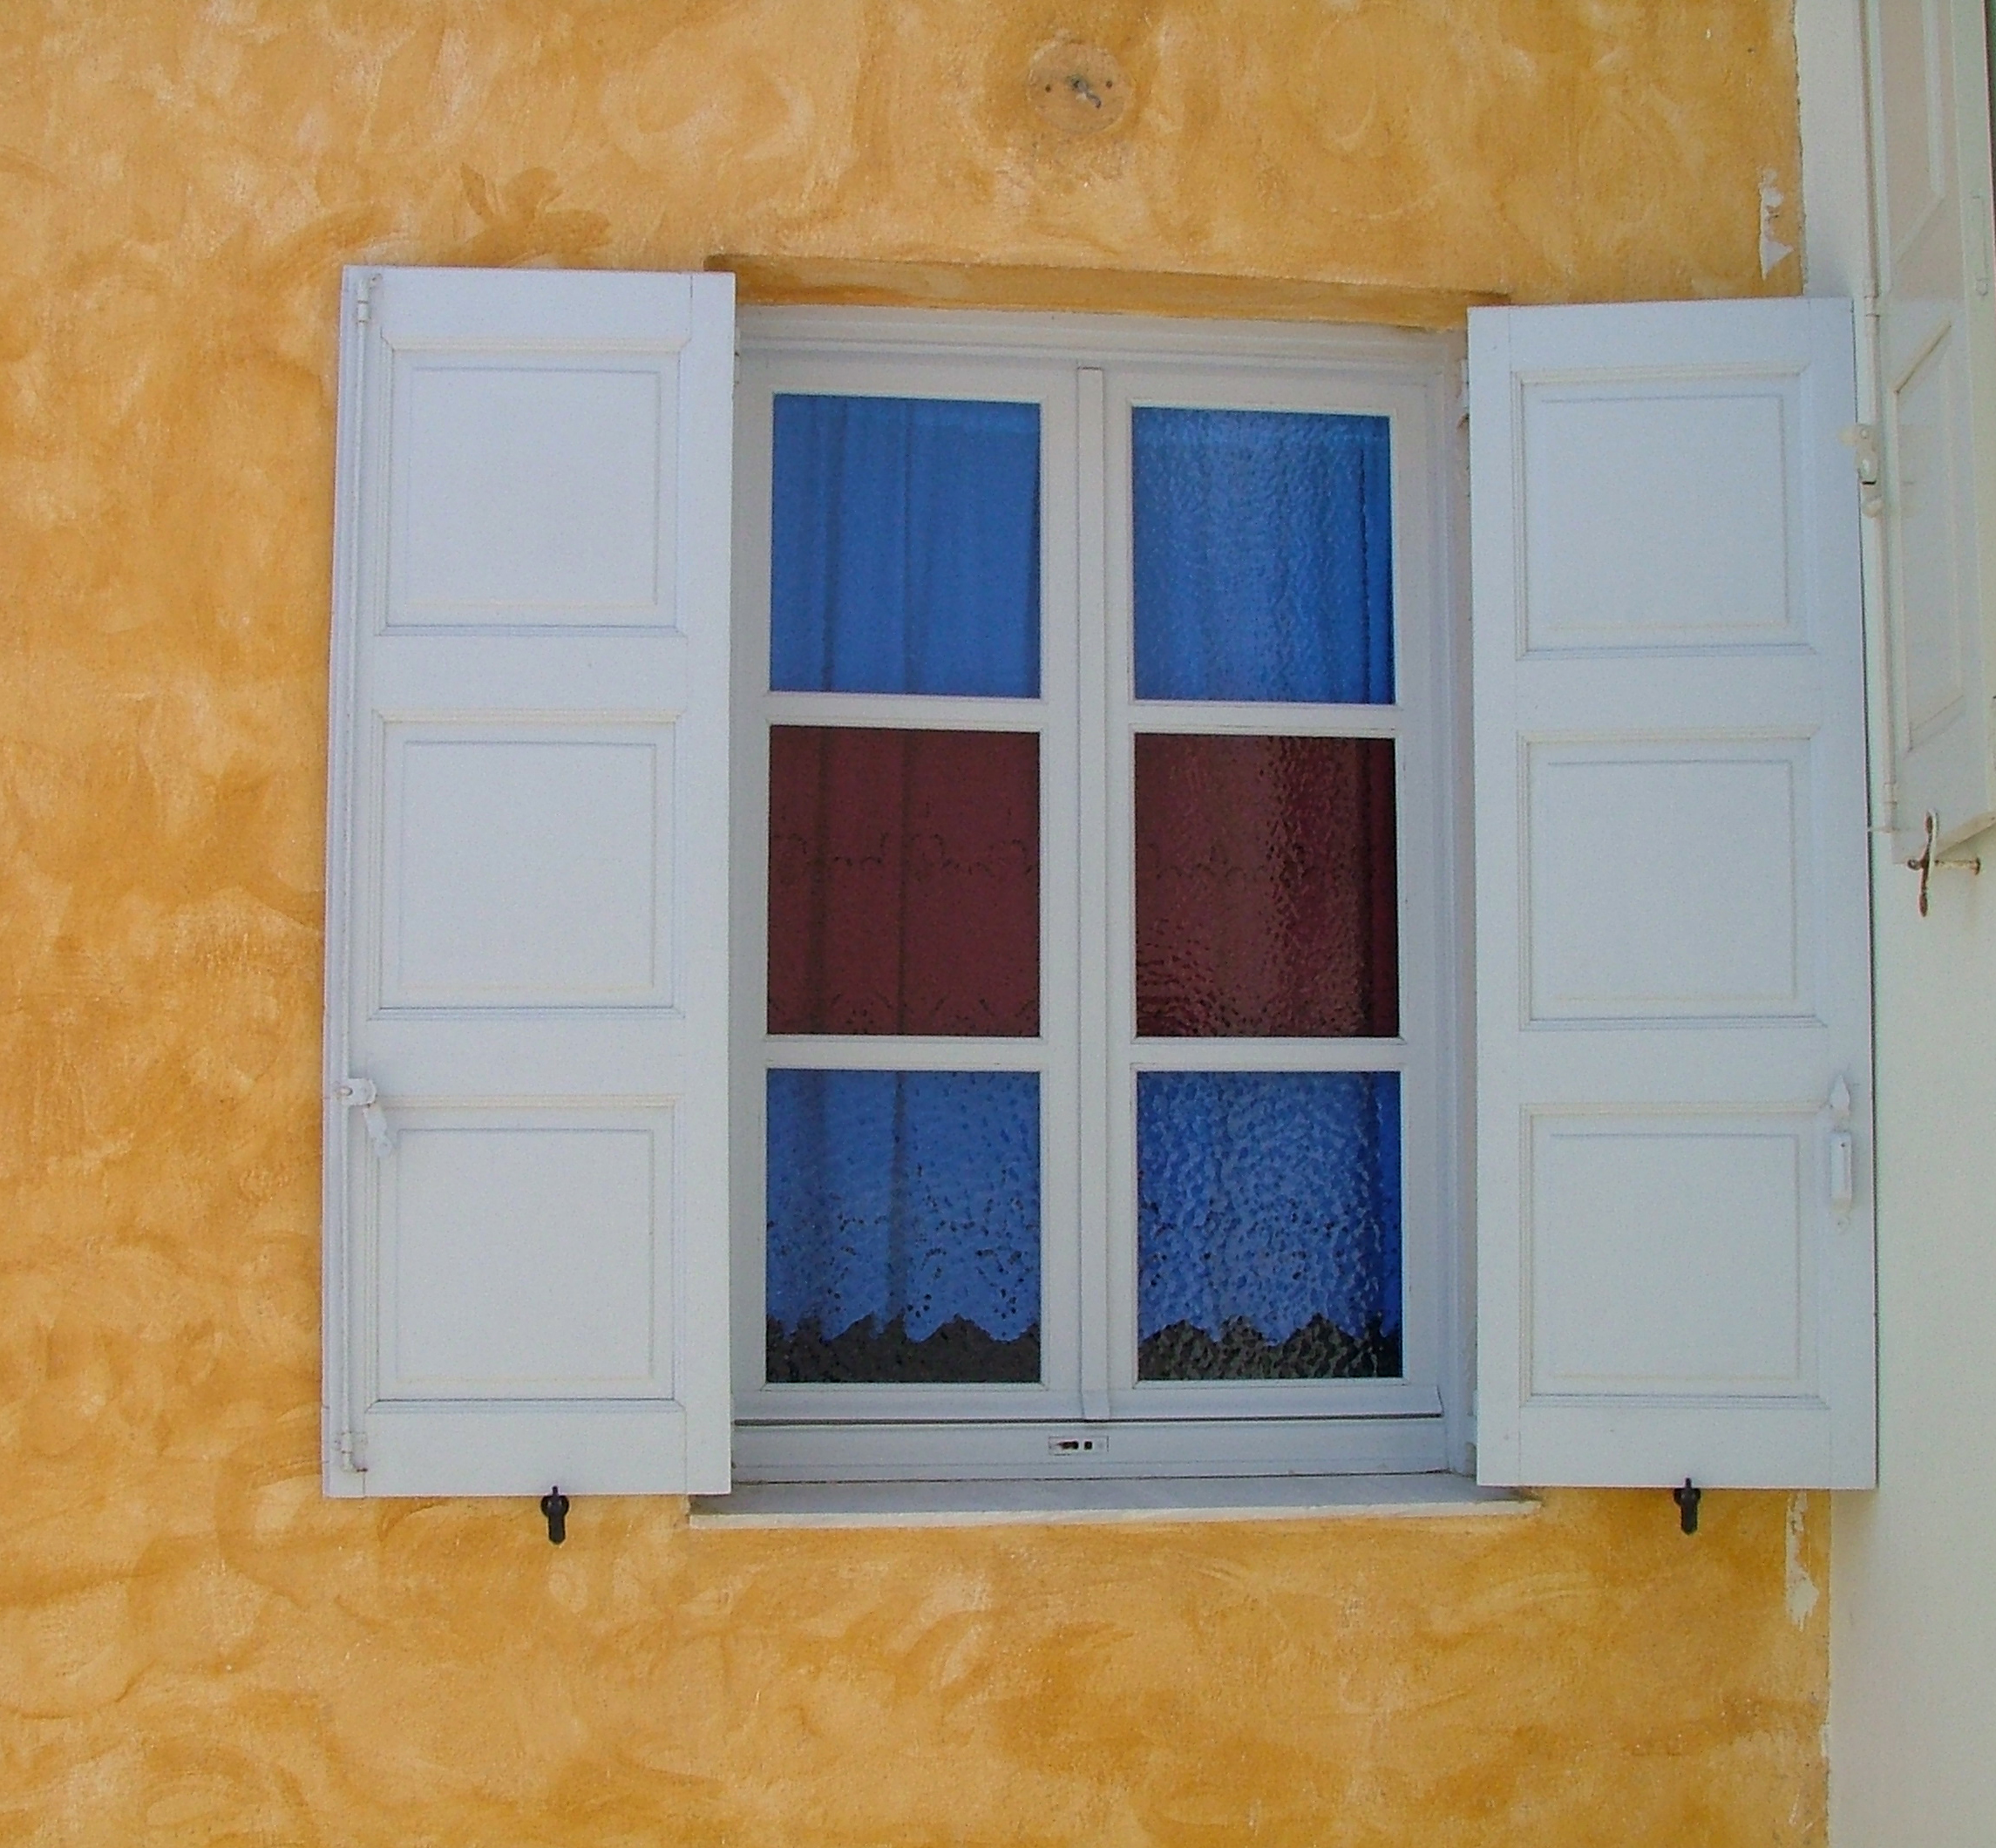 santorini window, Glass, Greece, Open, Santorini, HQ Photo